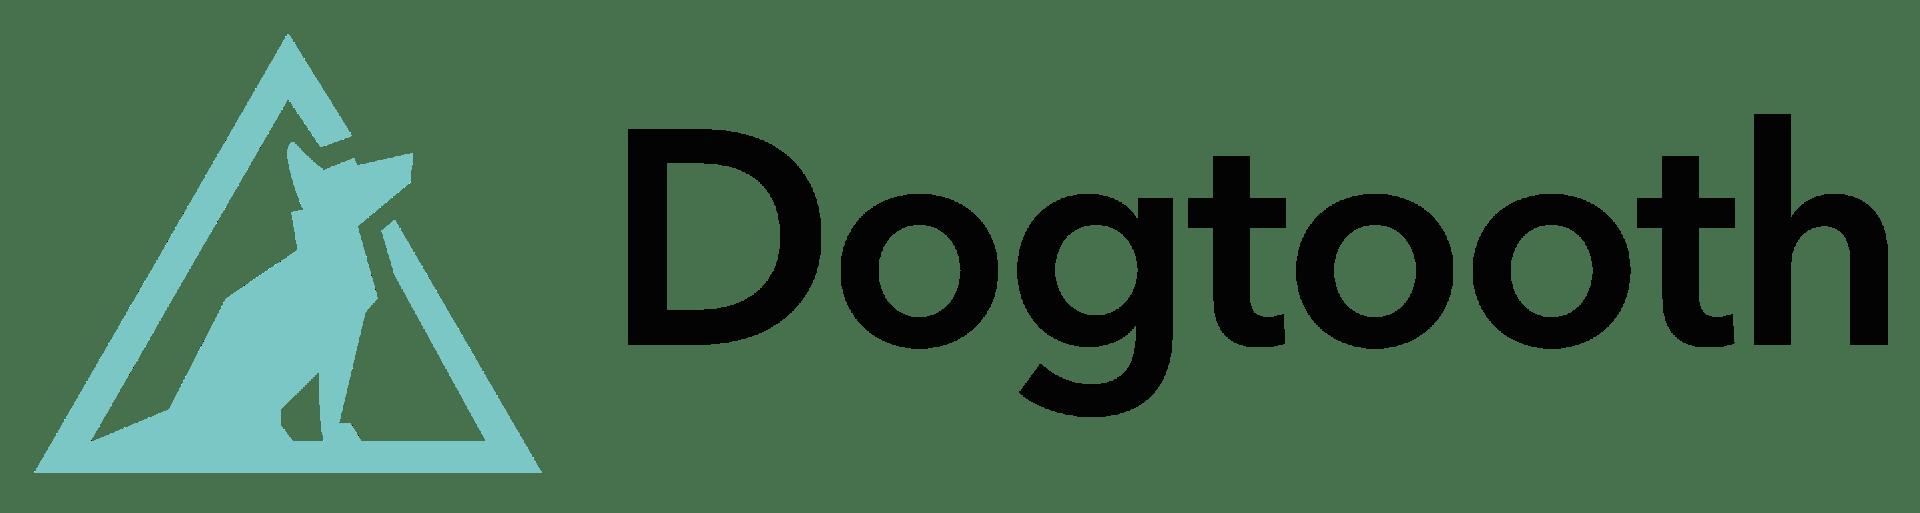 Dogtooth logo.